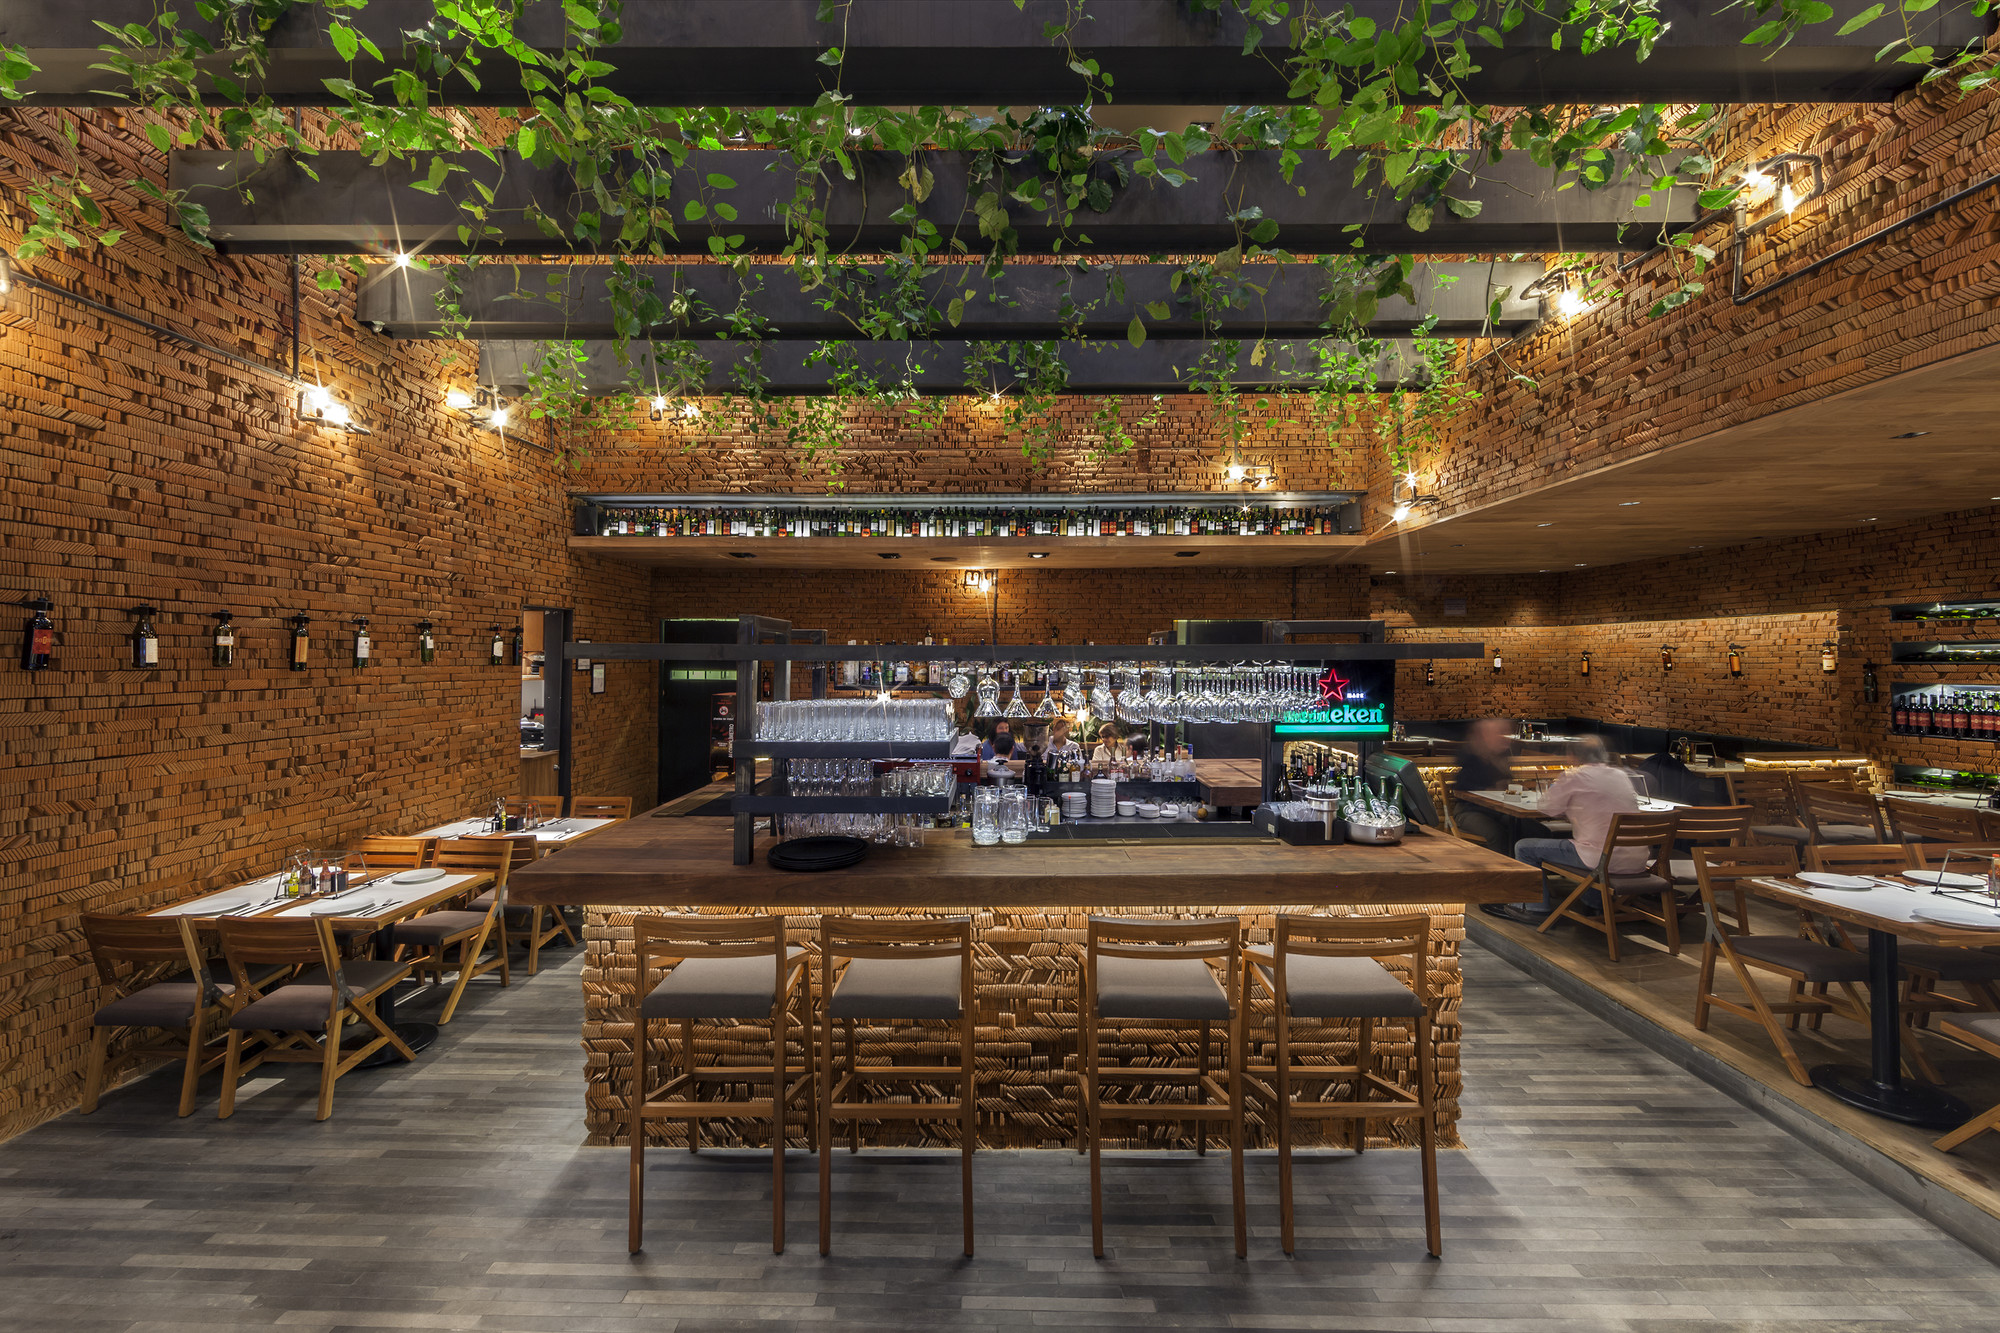 Restaurante 50 friends cherem arquitectos archdaily for Restaurante arquitectura